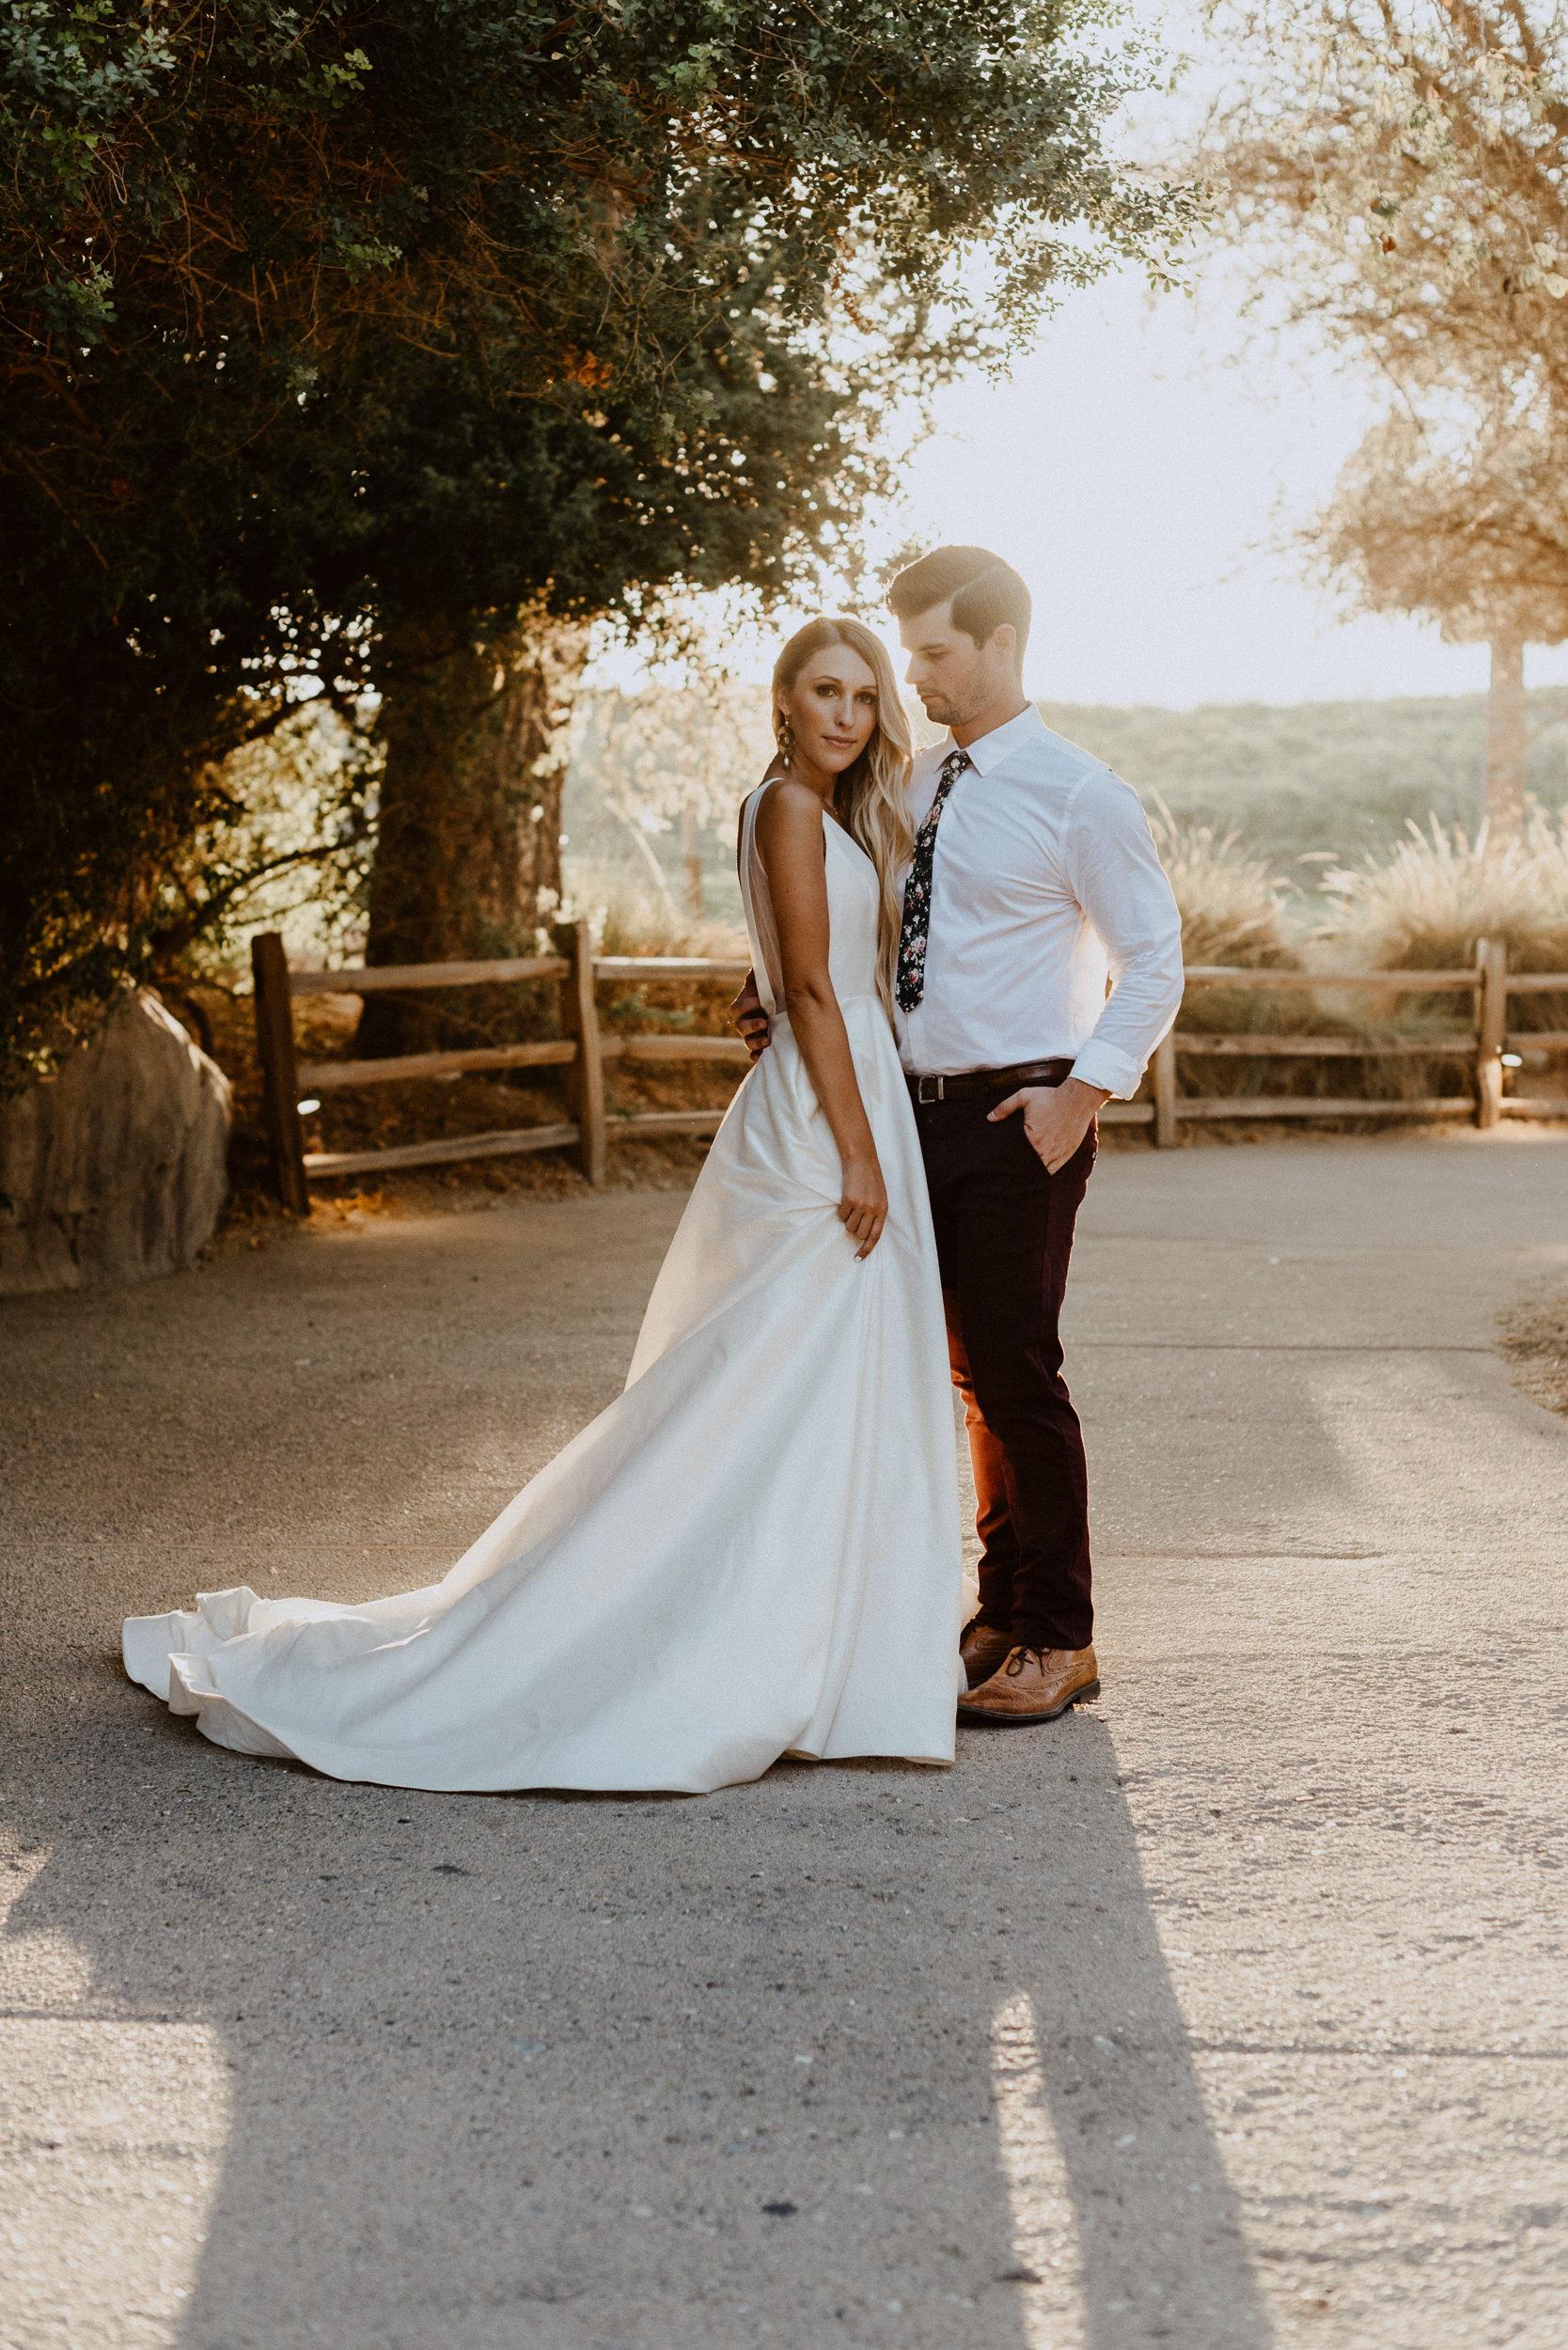 sChelsie + Chris - The Desert Shootout Wedding Romantics at The Living Desert-149.jpg